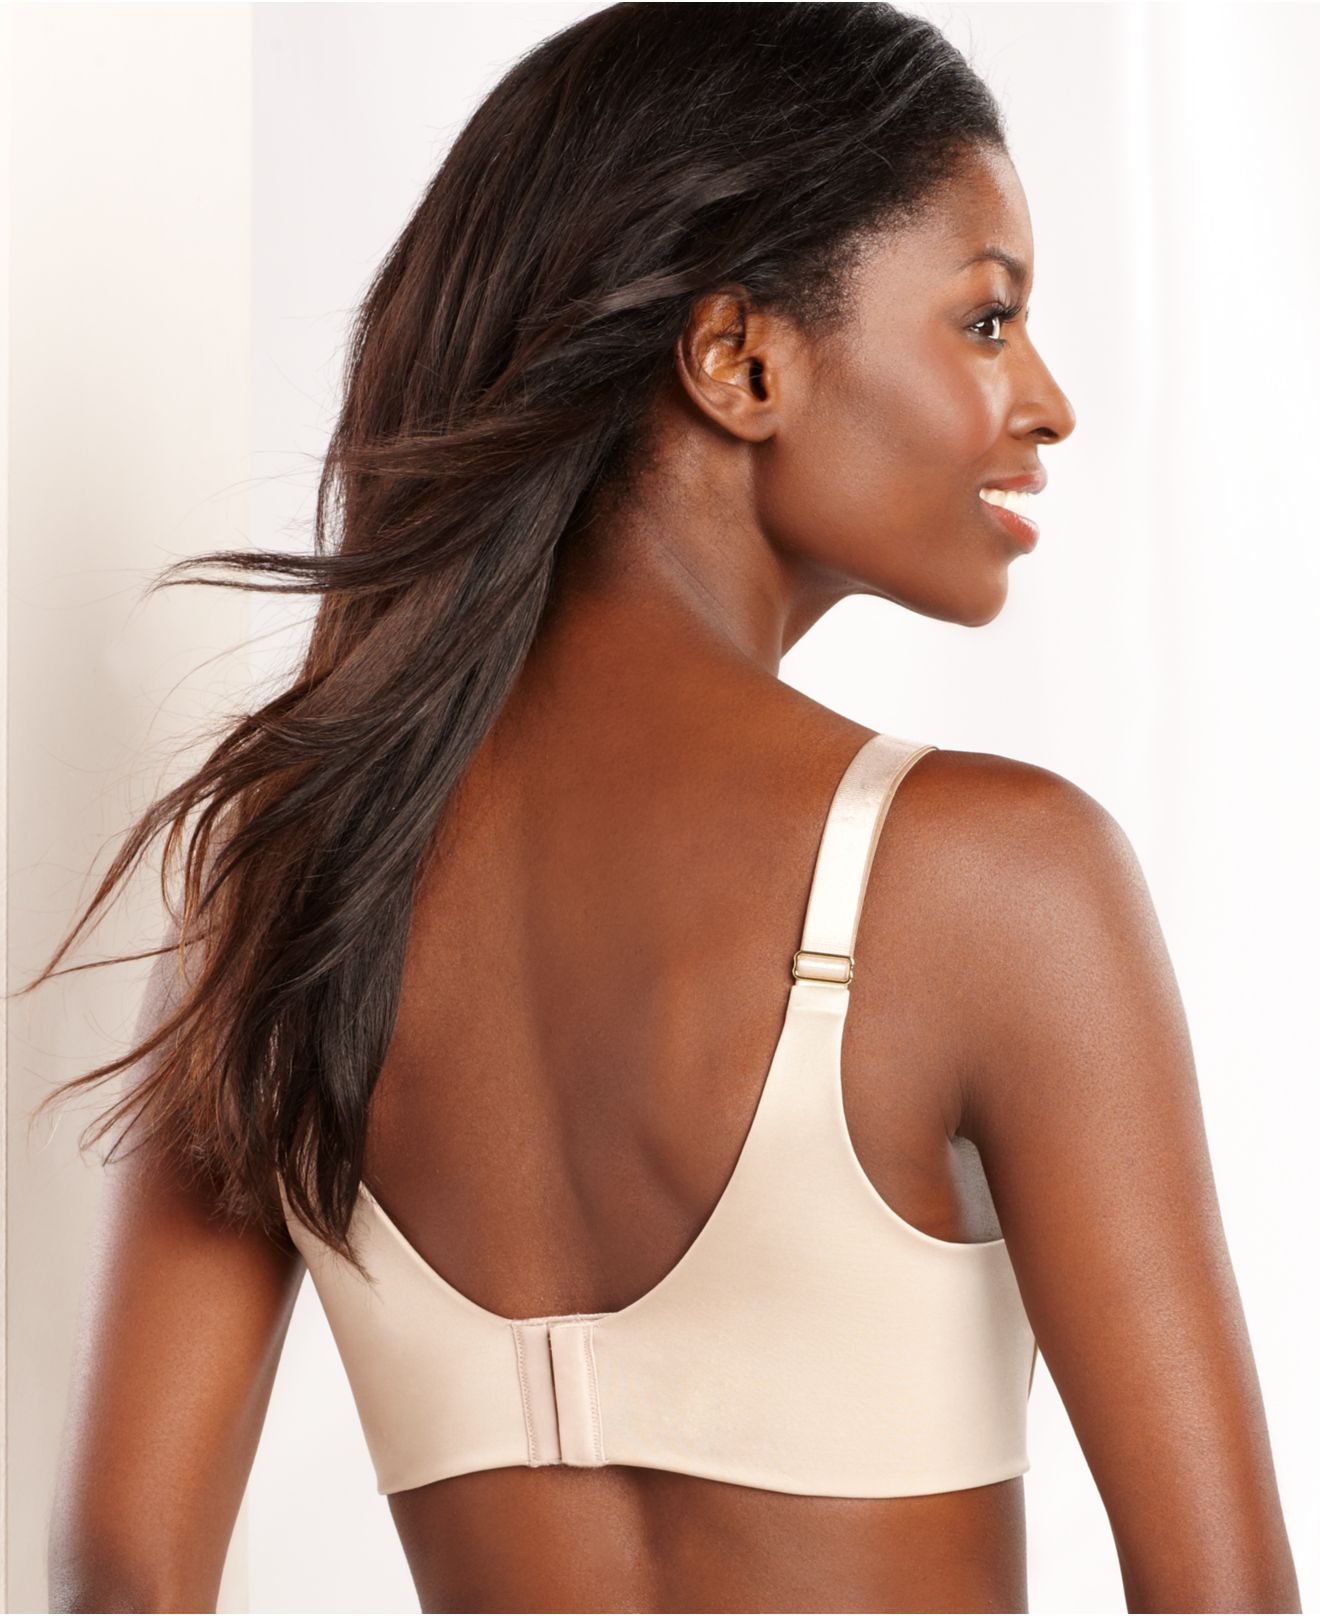 4b57d684d1476 Lyst - Vanity Fair Beauty Back Full Figure Underwire Bra 76145 in Brown